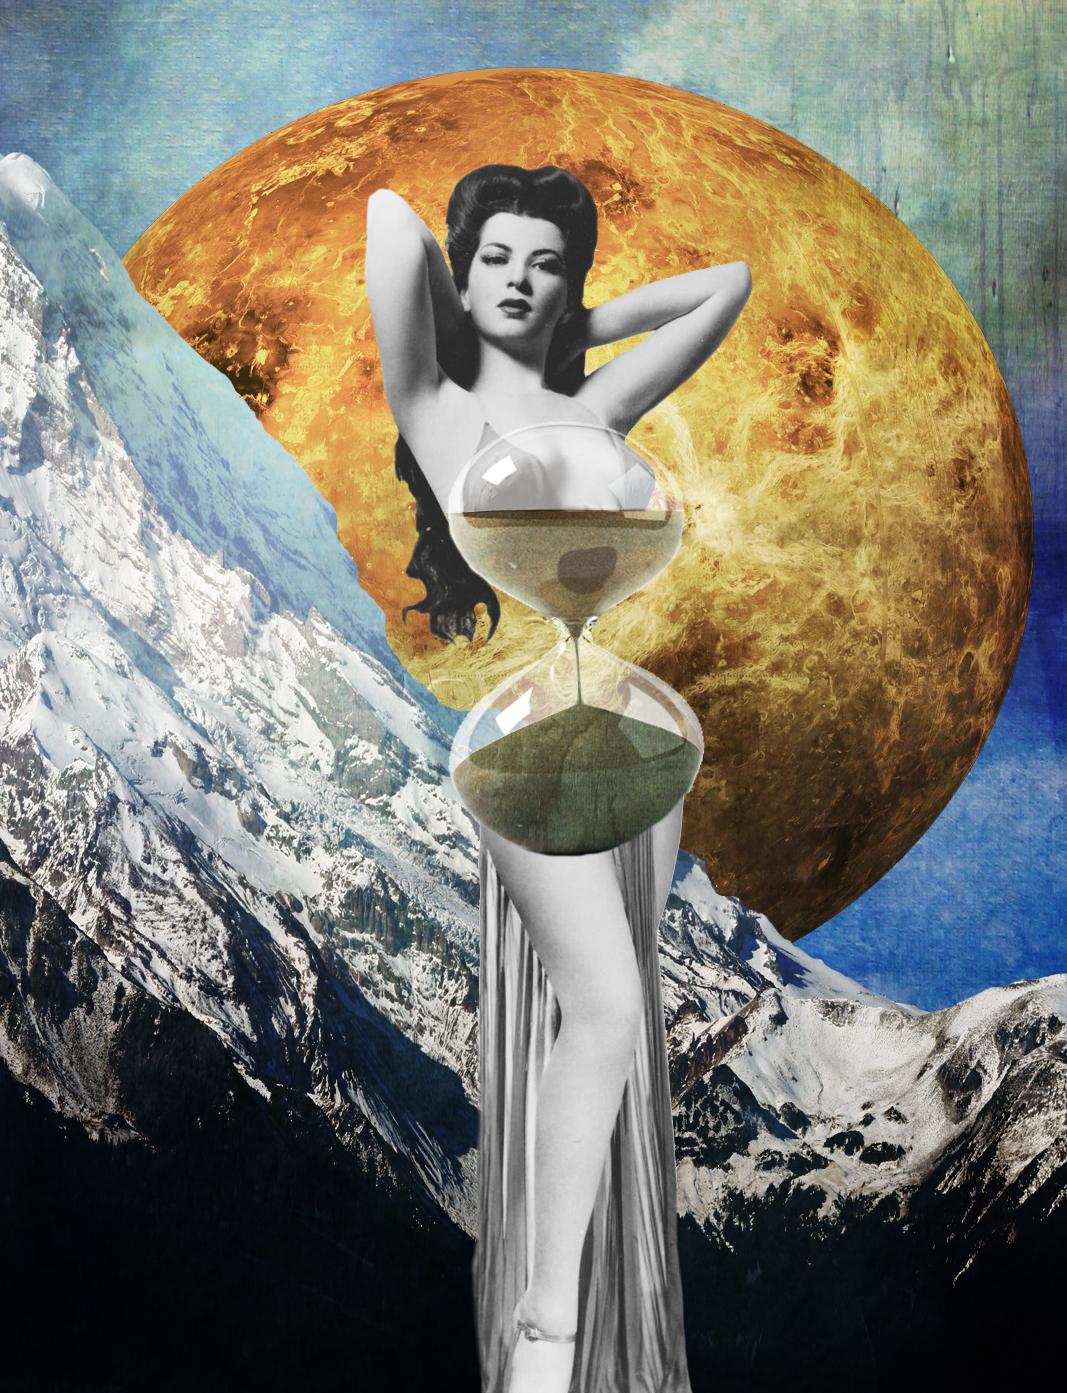 Jenkins, Cheyenne. Hourglass. 2015. Digital Collage. Montreal, Quebec